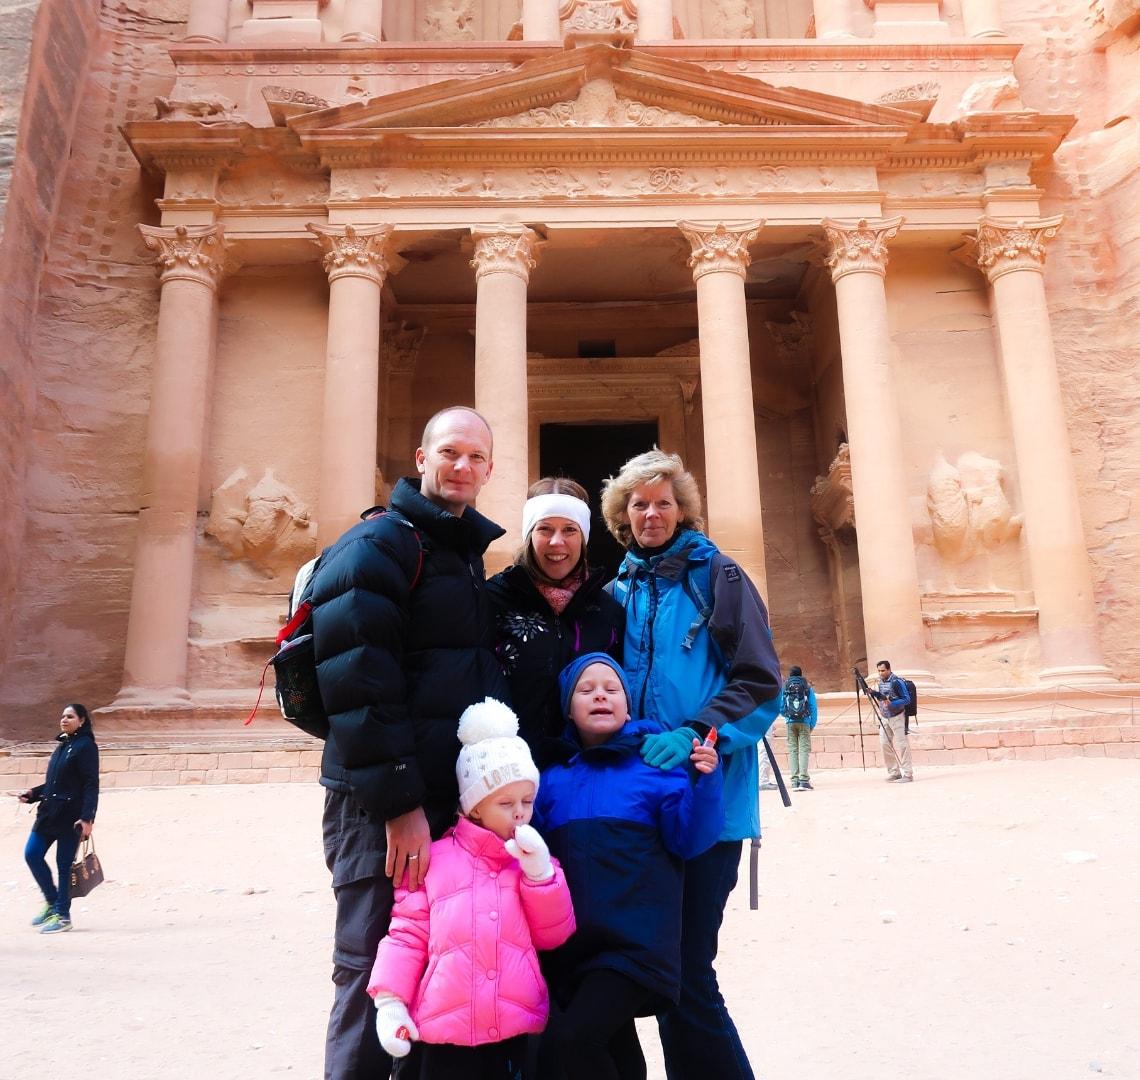 Reasons to Travel - wanderlust family in Petra, Jordan